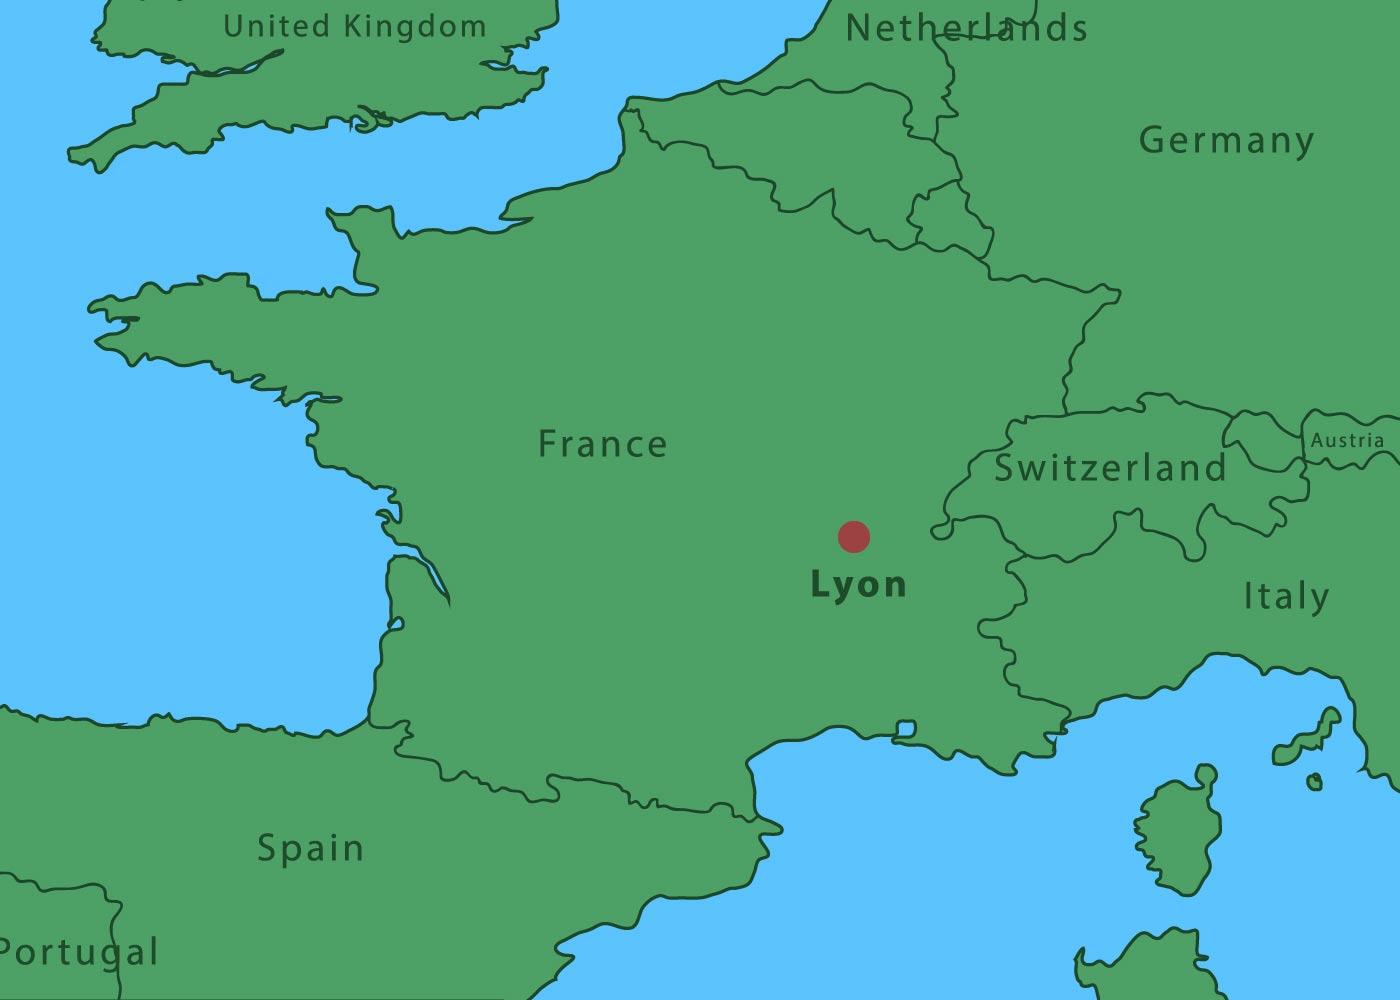 Map Of Lyon City Download Free Vectors Clipart Graphics